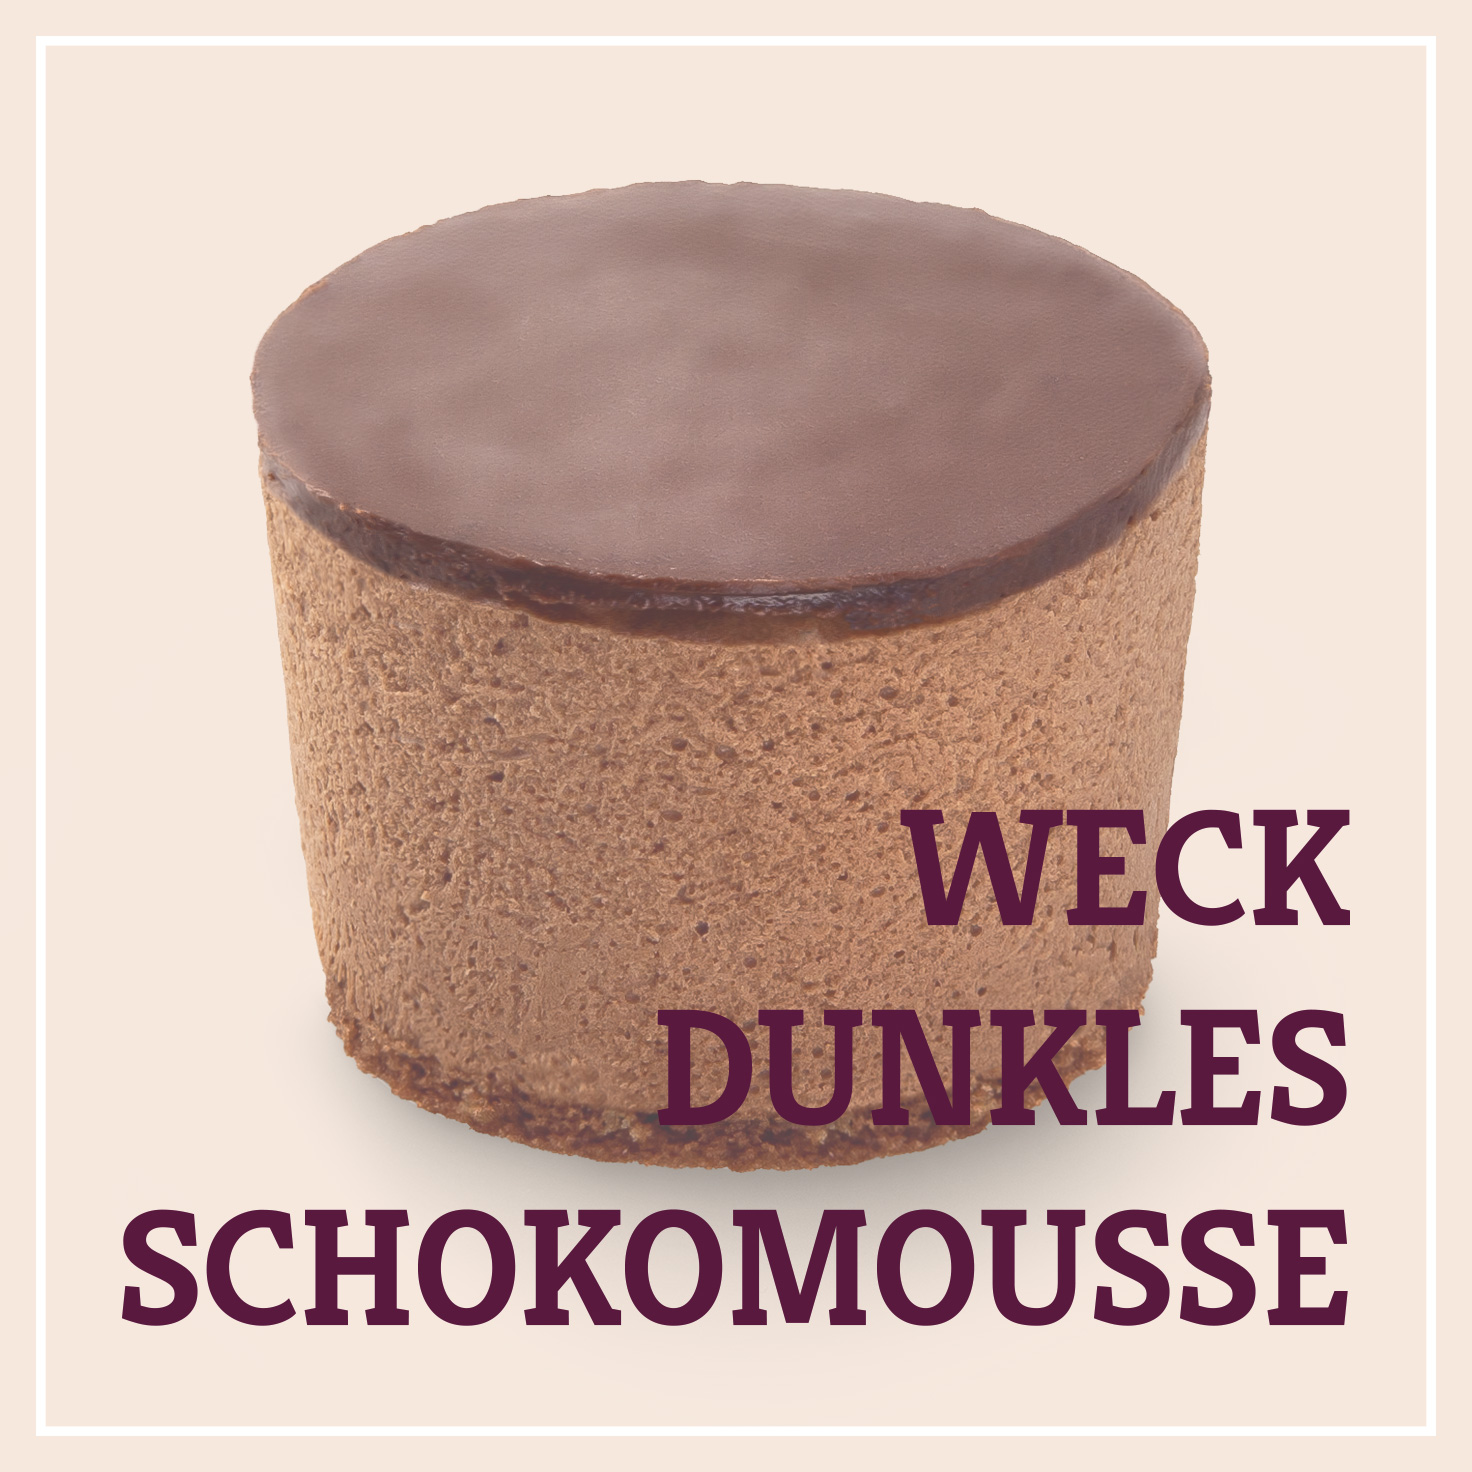 Heiss & Süß - Weck-Dunkles Schokomousse